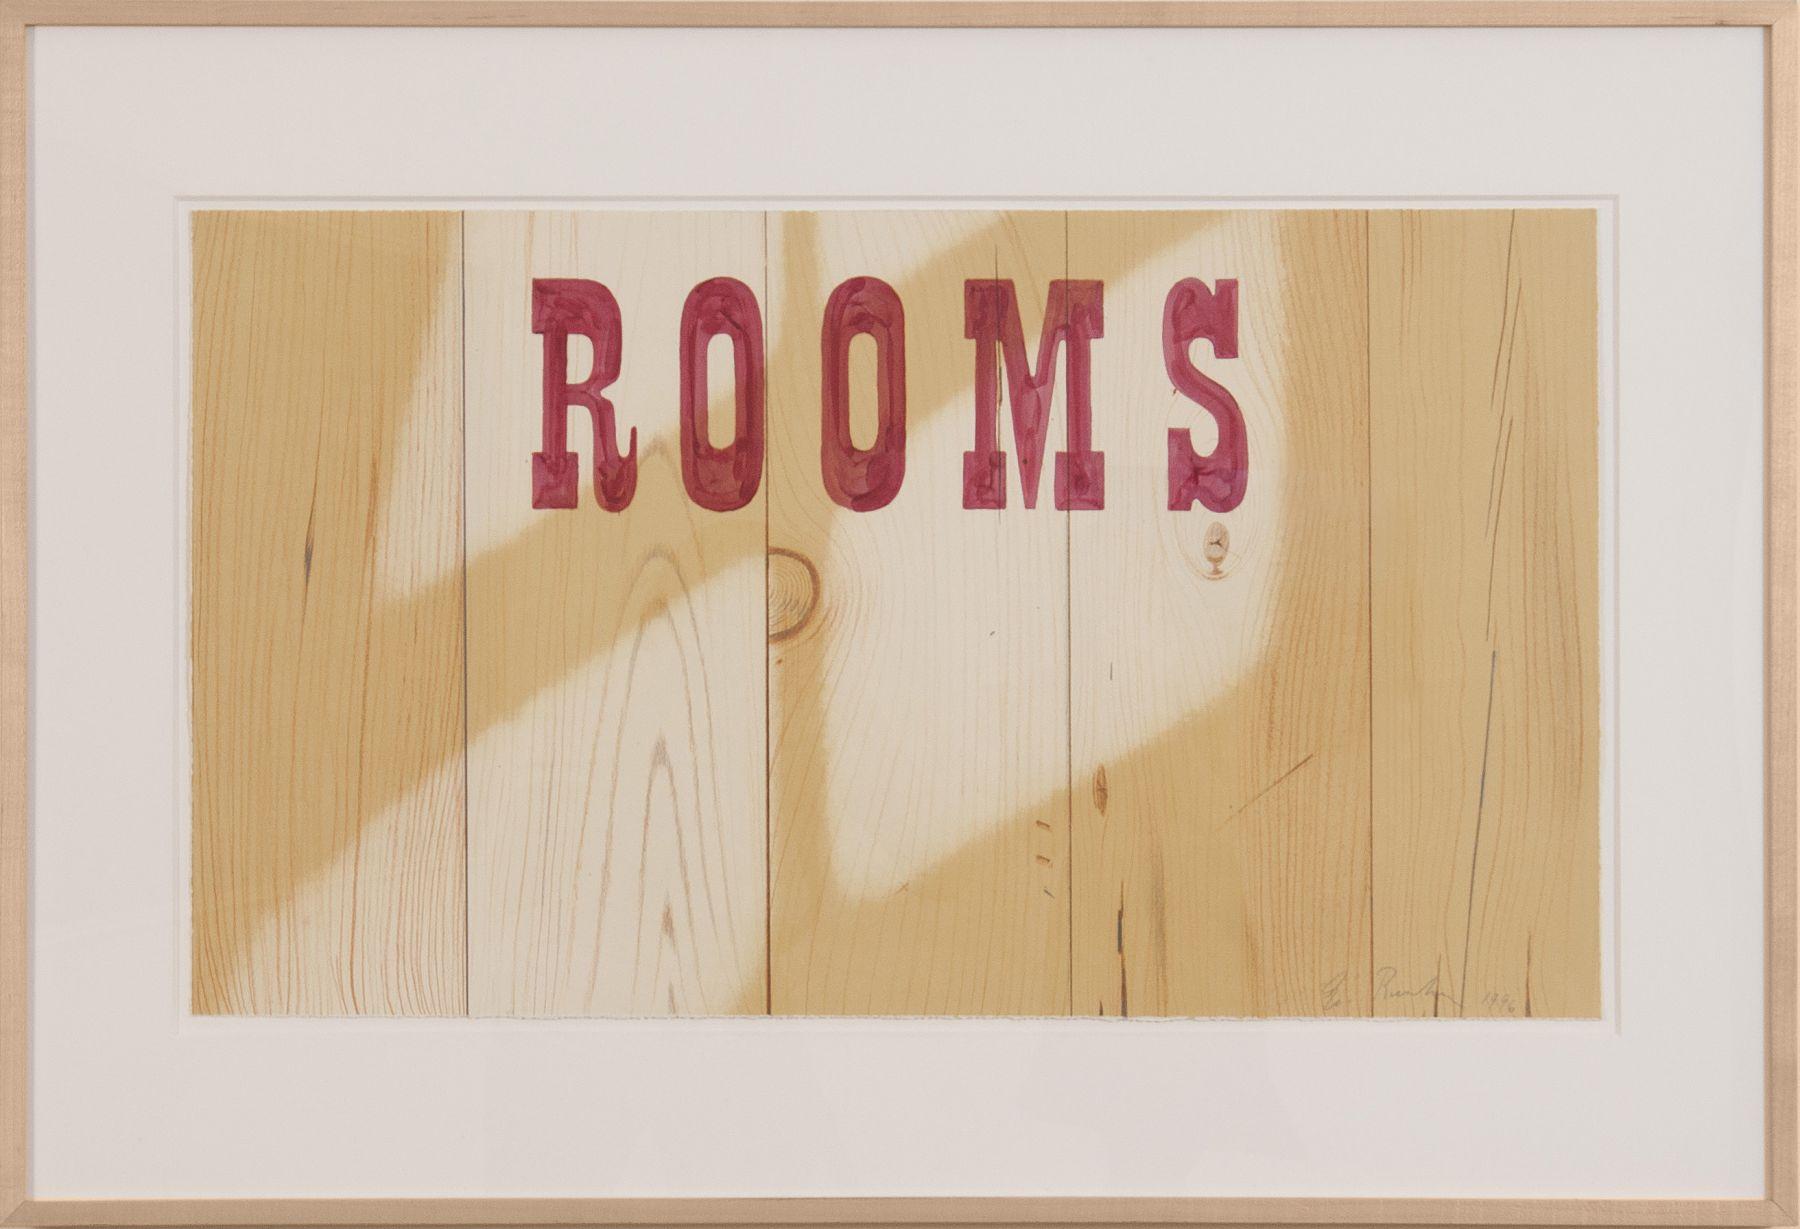 "Ed Ruscha_Rooms, 1996 (16"" x 28"") Frame-Casterline|Goodman Gallery.jpg"